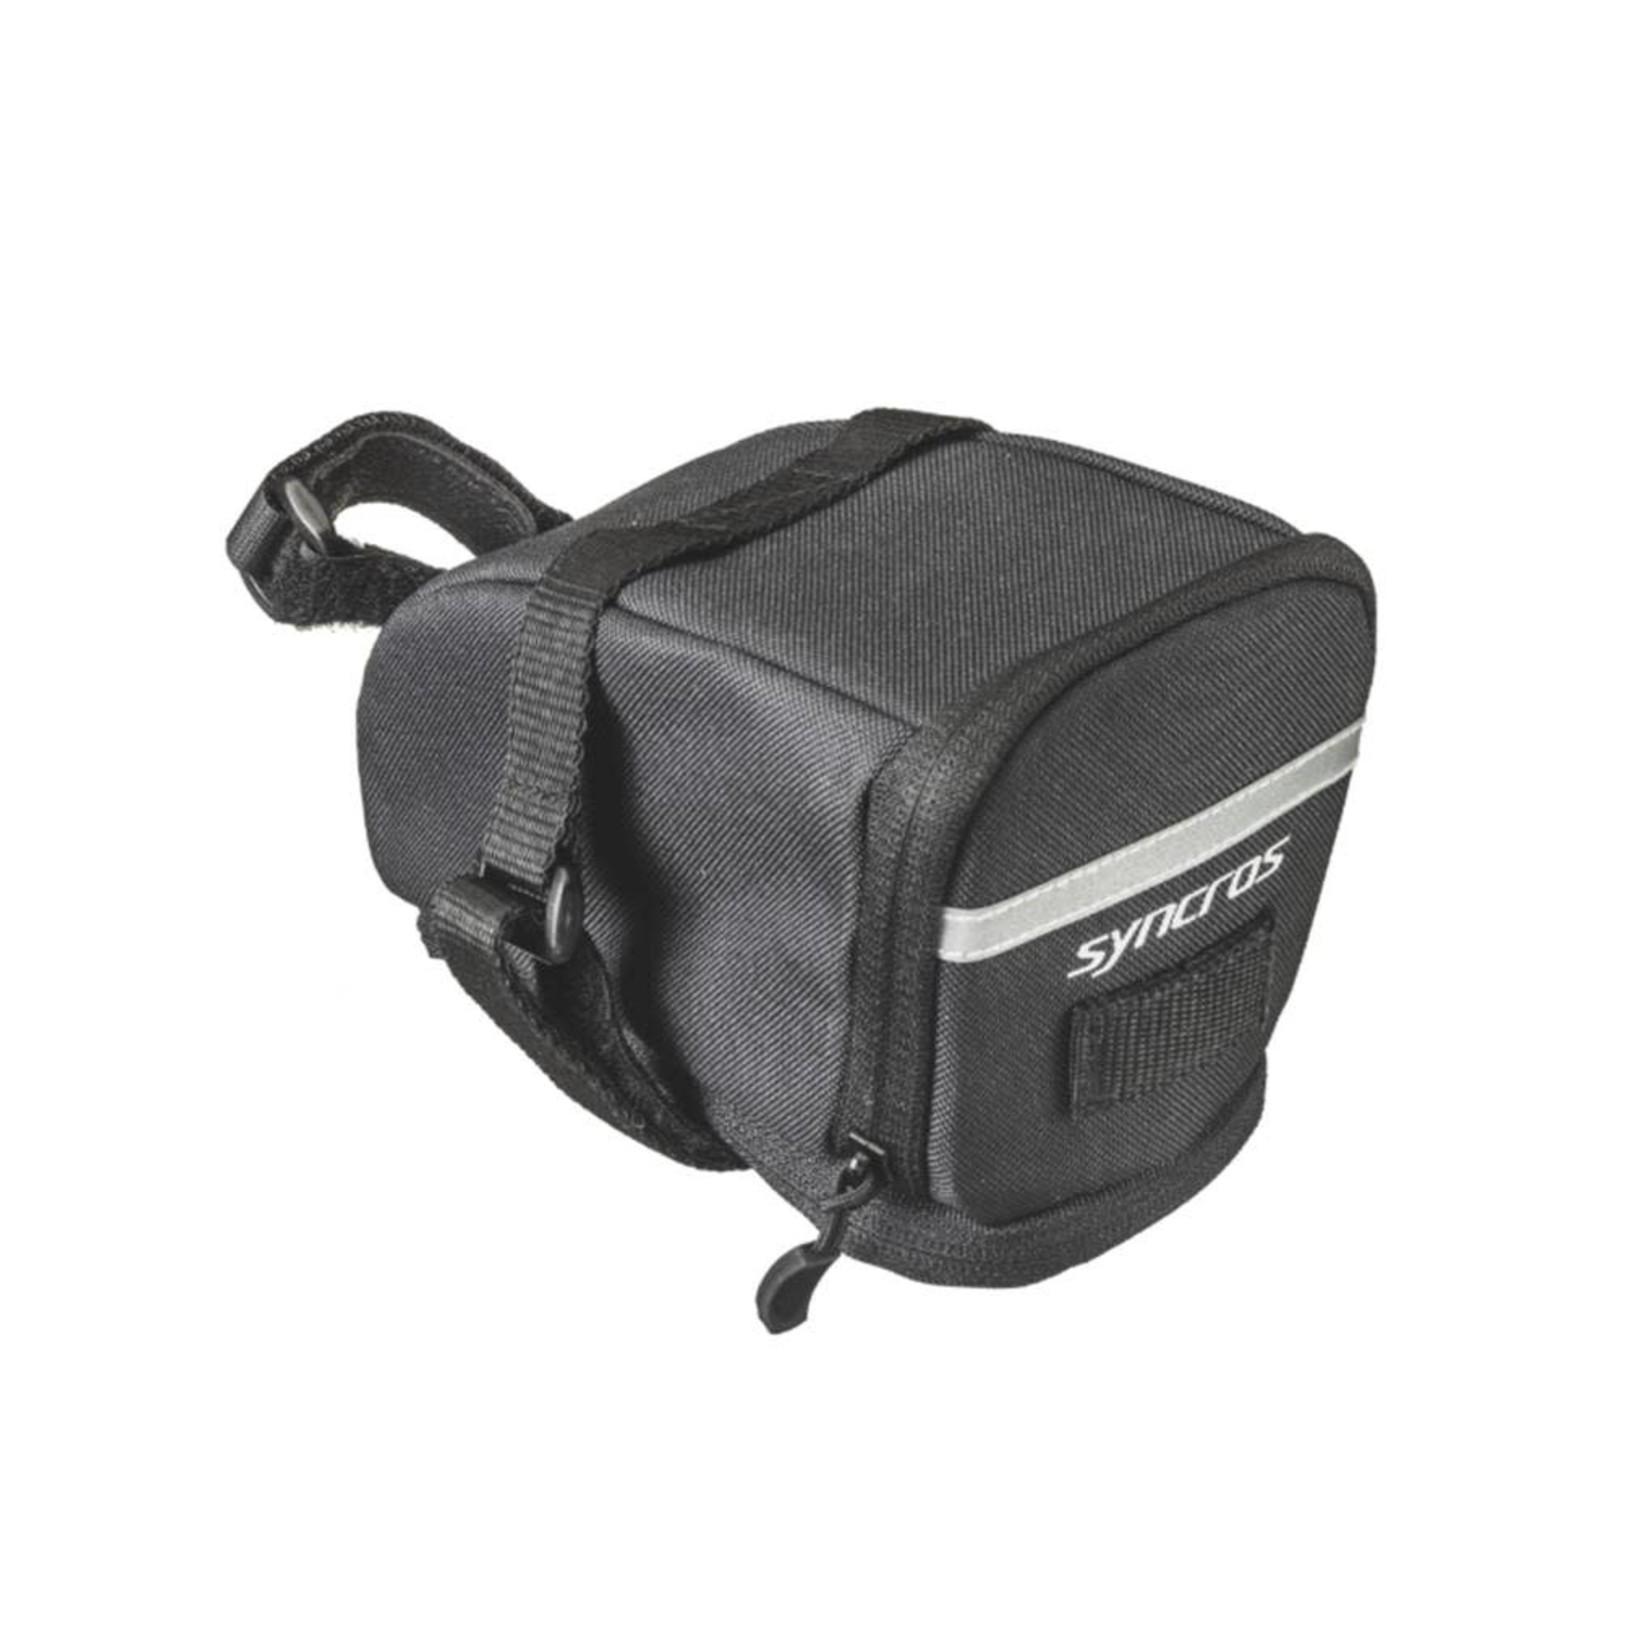 Syncros Bicycle Saddle Bag Black